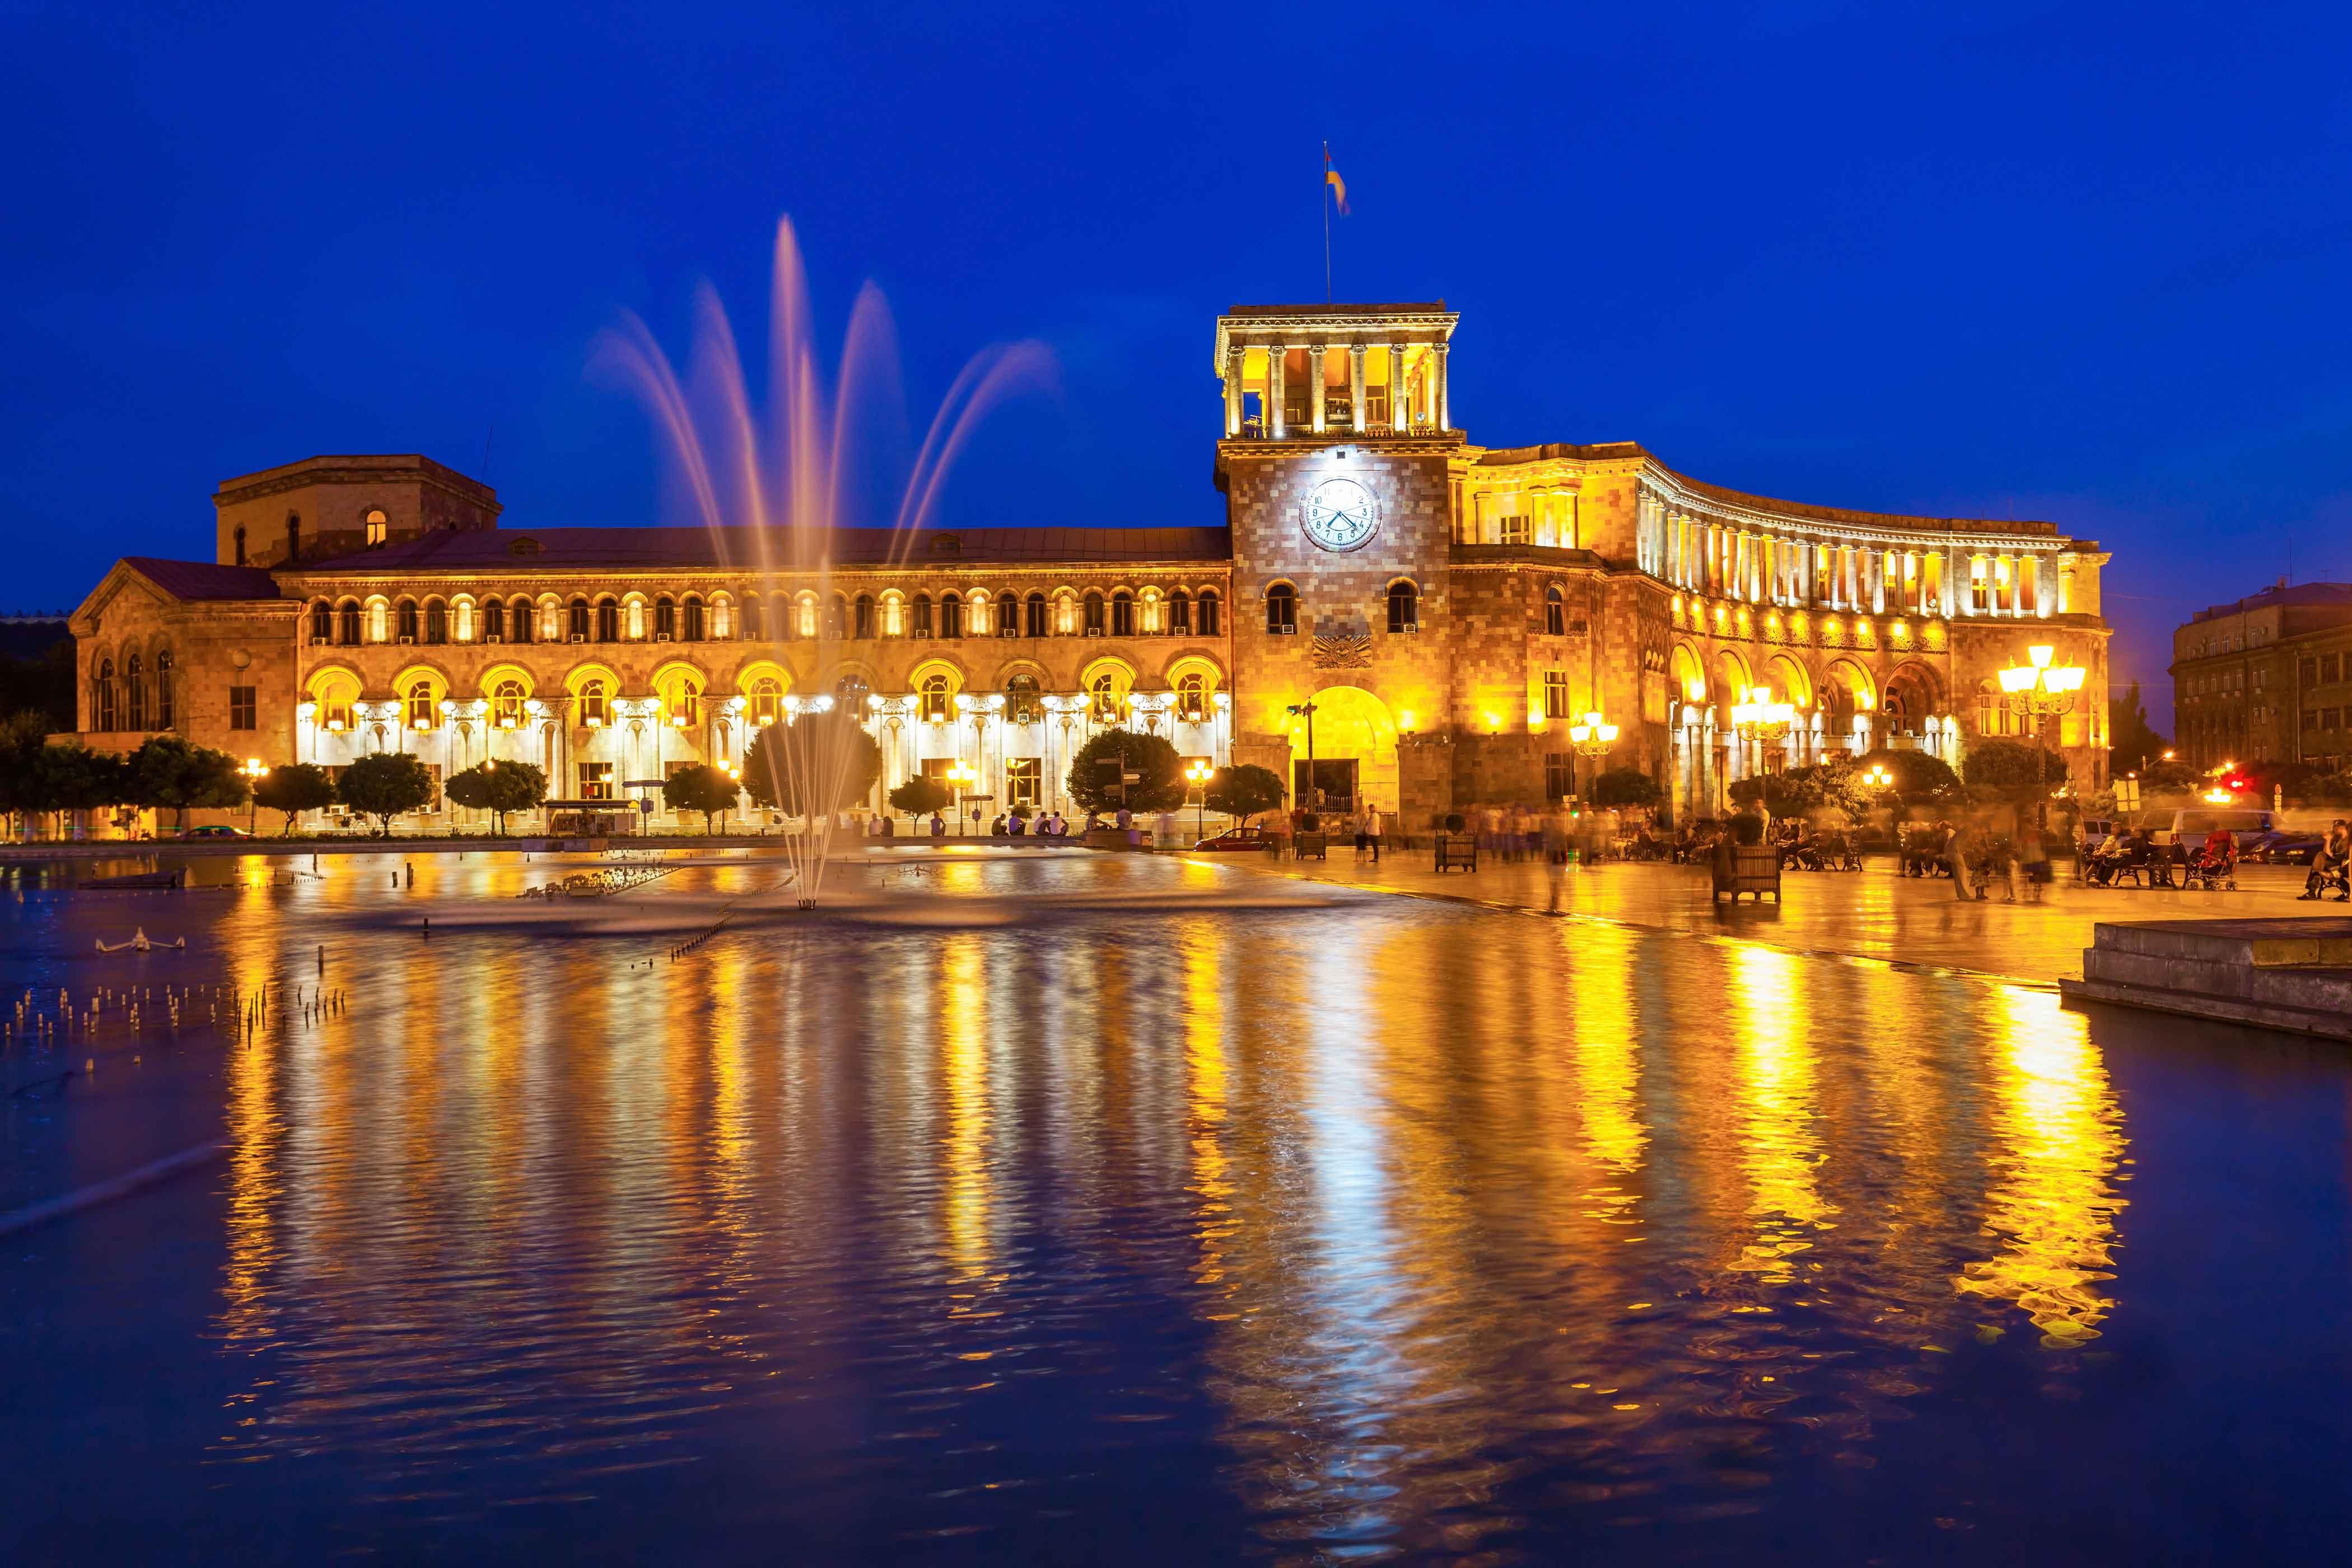 площадь республики Еревана